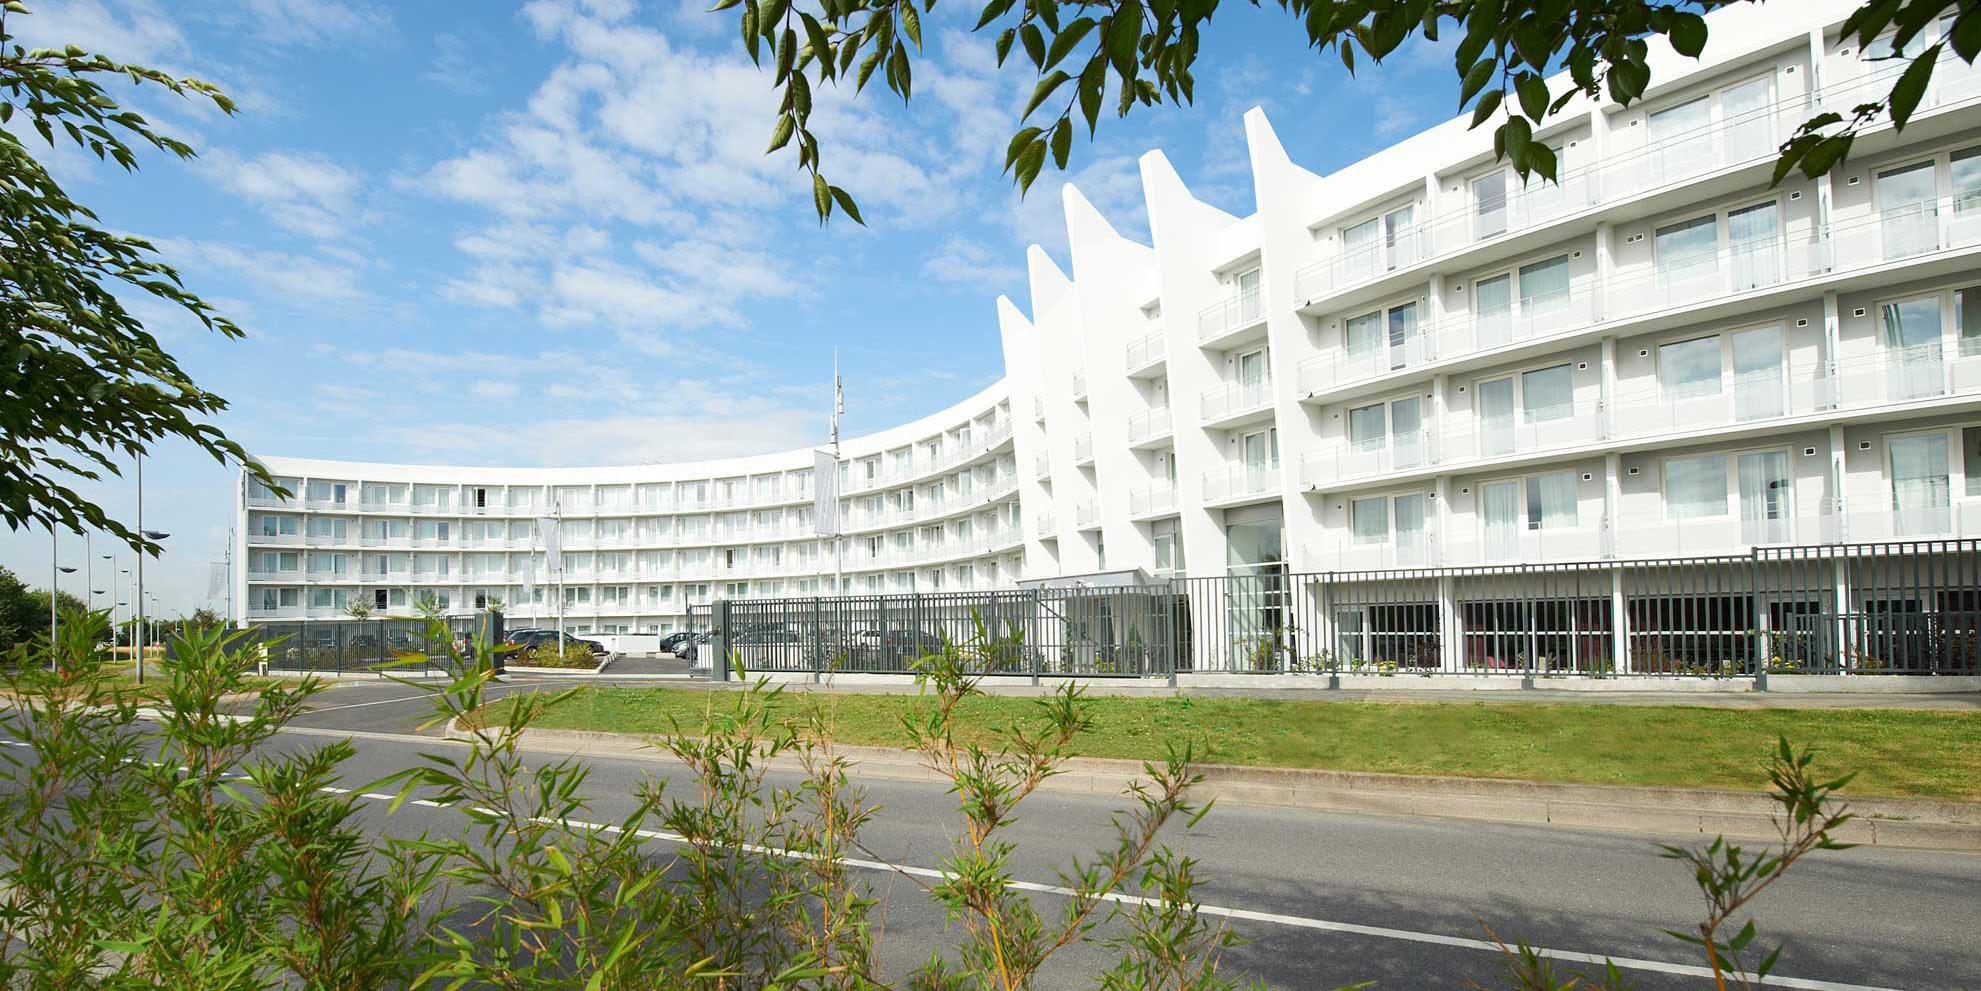 Paris Airport Hotel With Spa | Crowne Plaza Paris - Charles De Gaulle